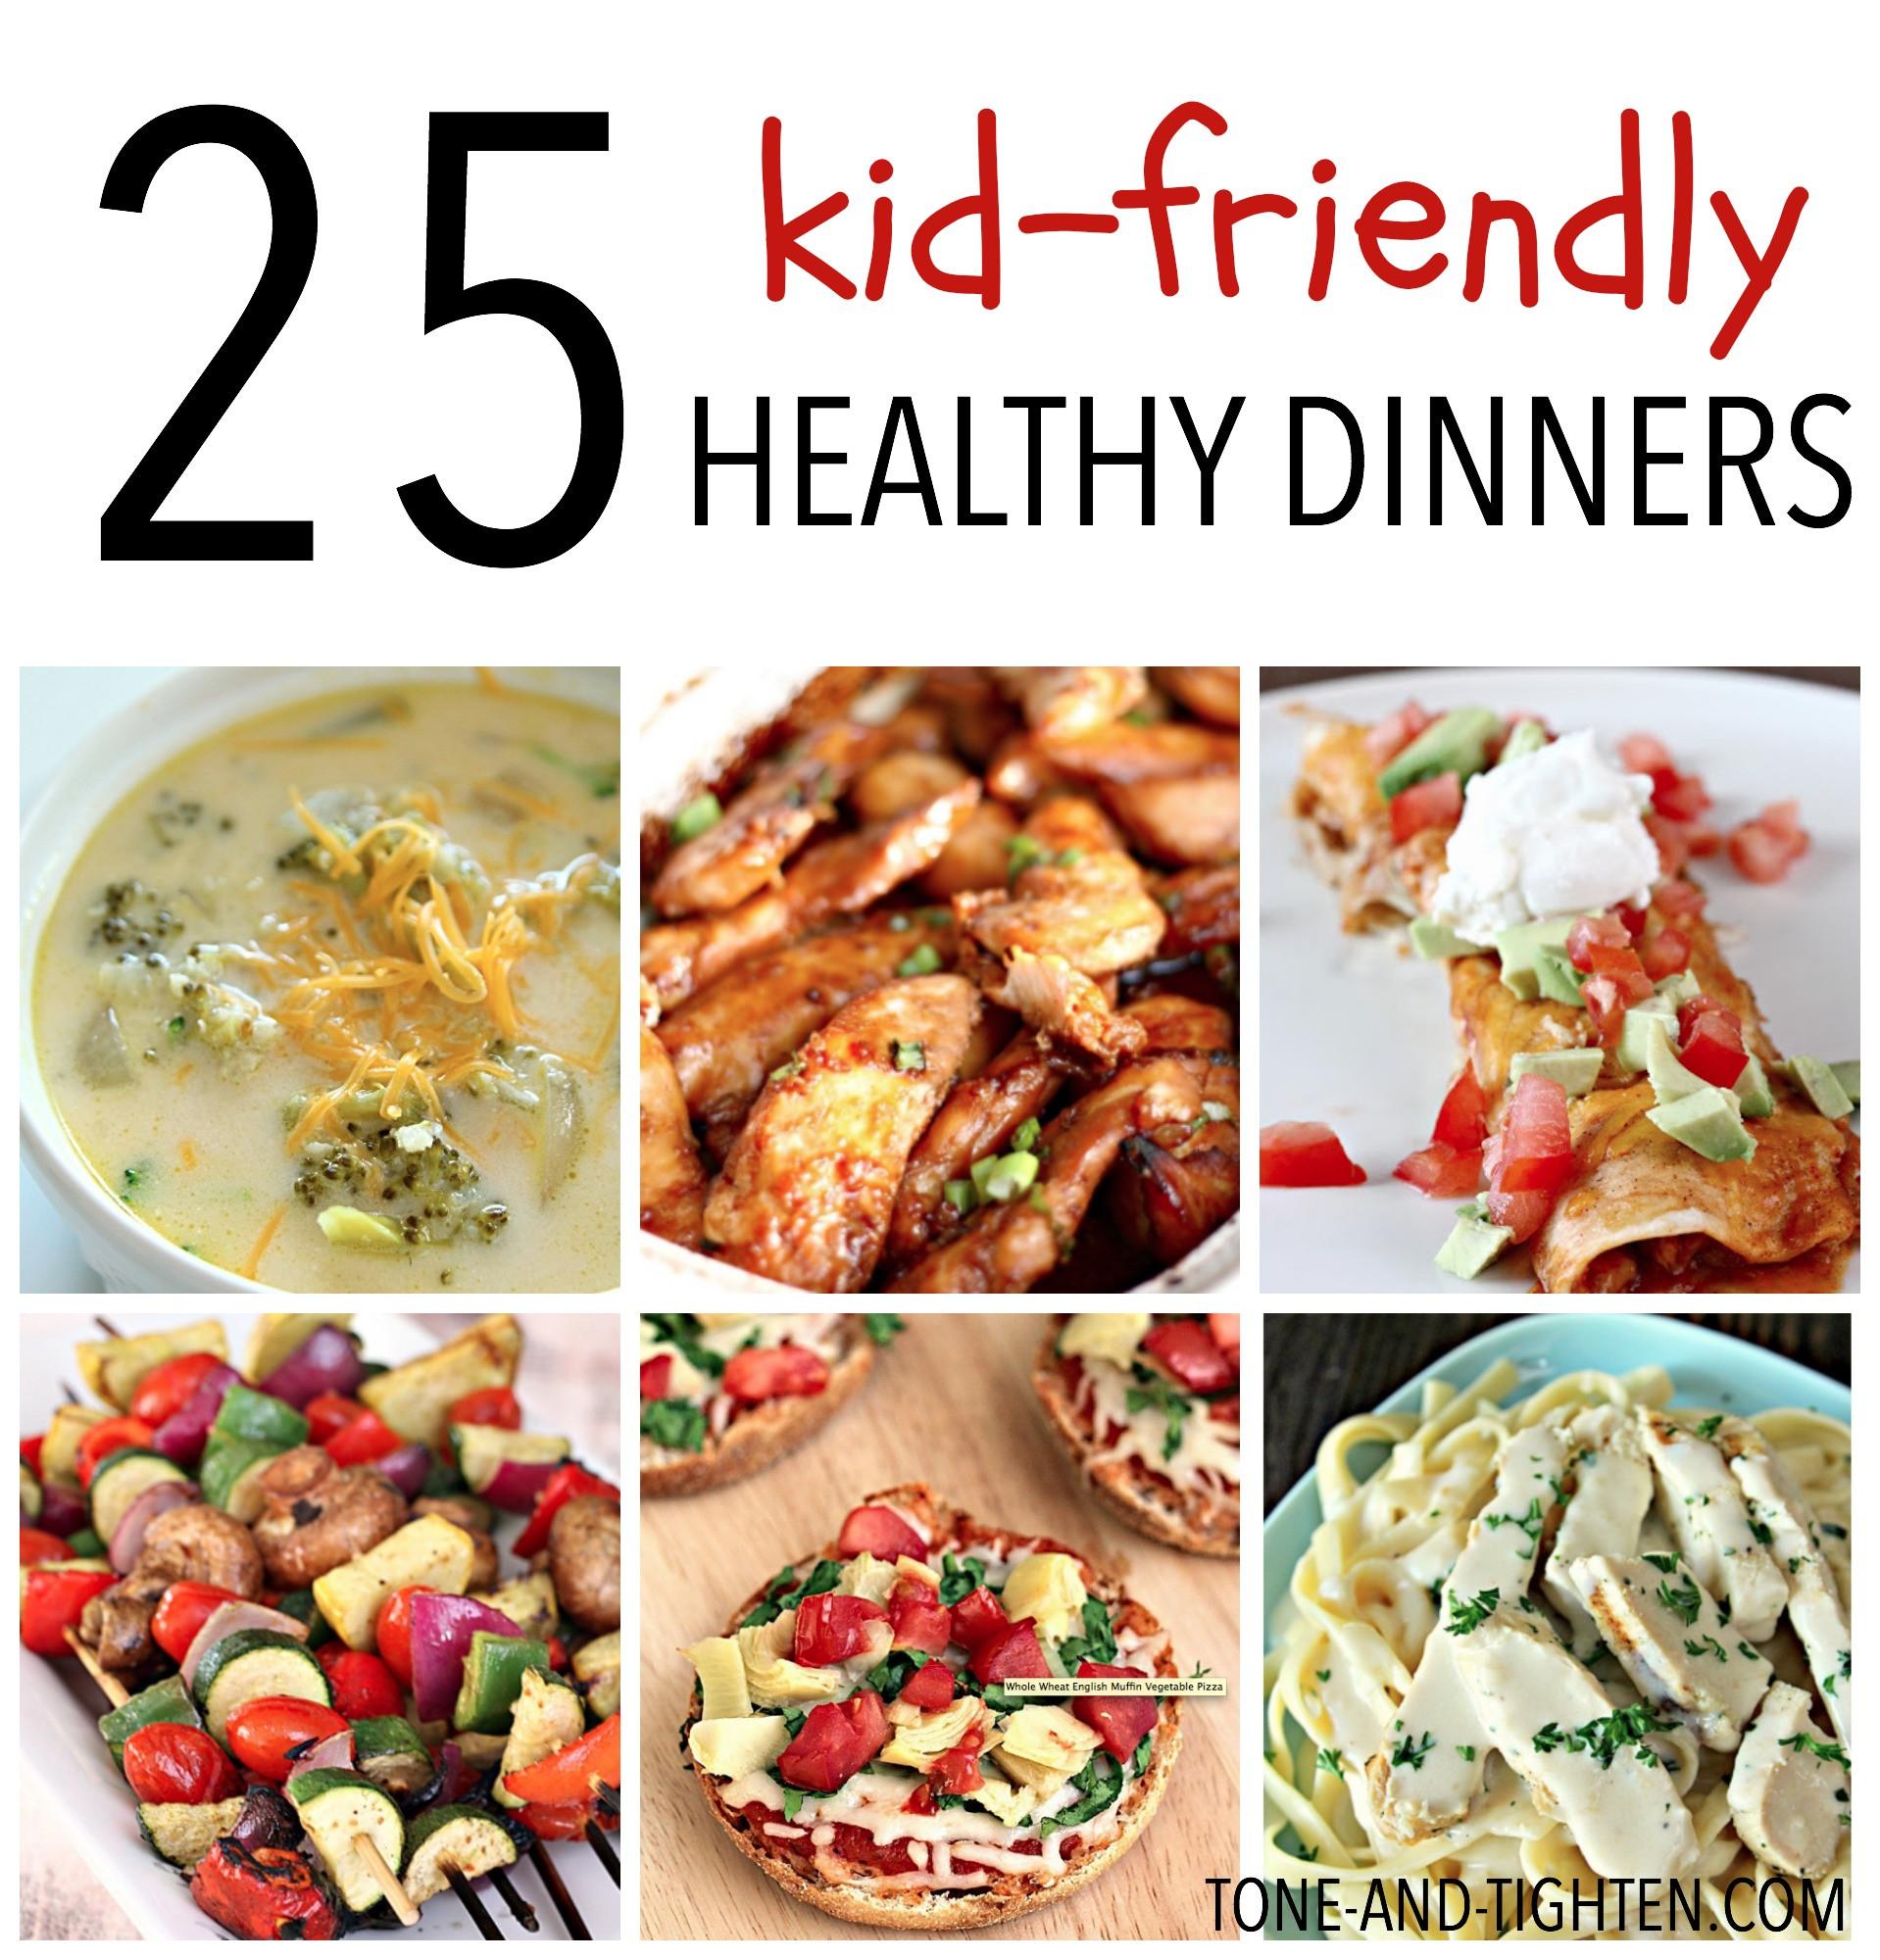 Easy Healthy Kid Friendly Recipes  25 Kid Friendly Healthy Dinners